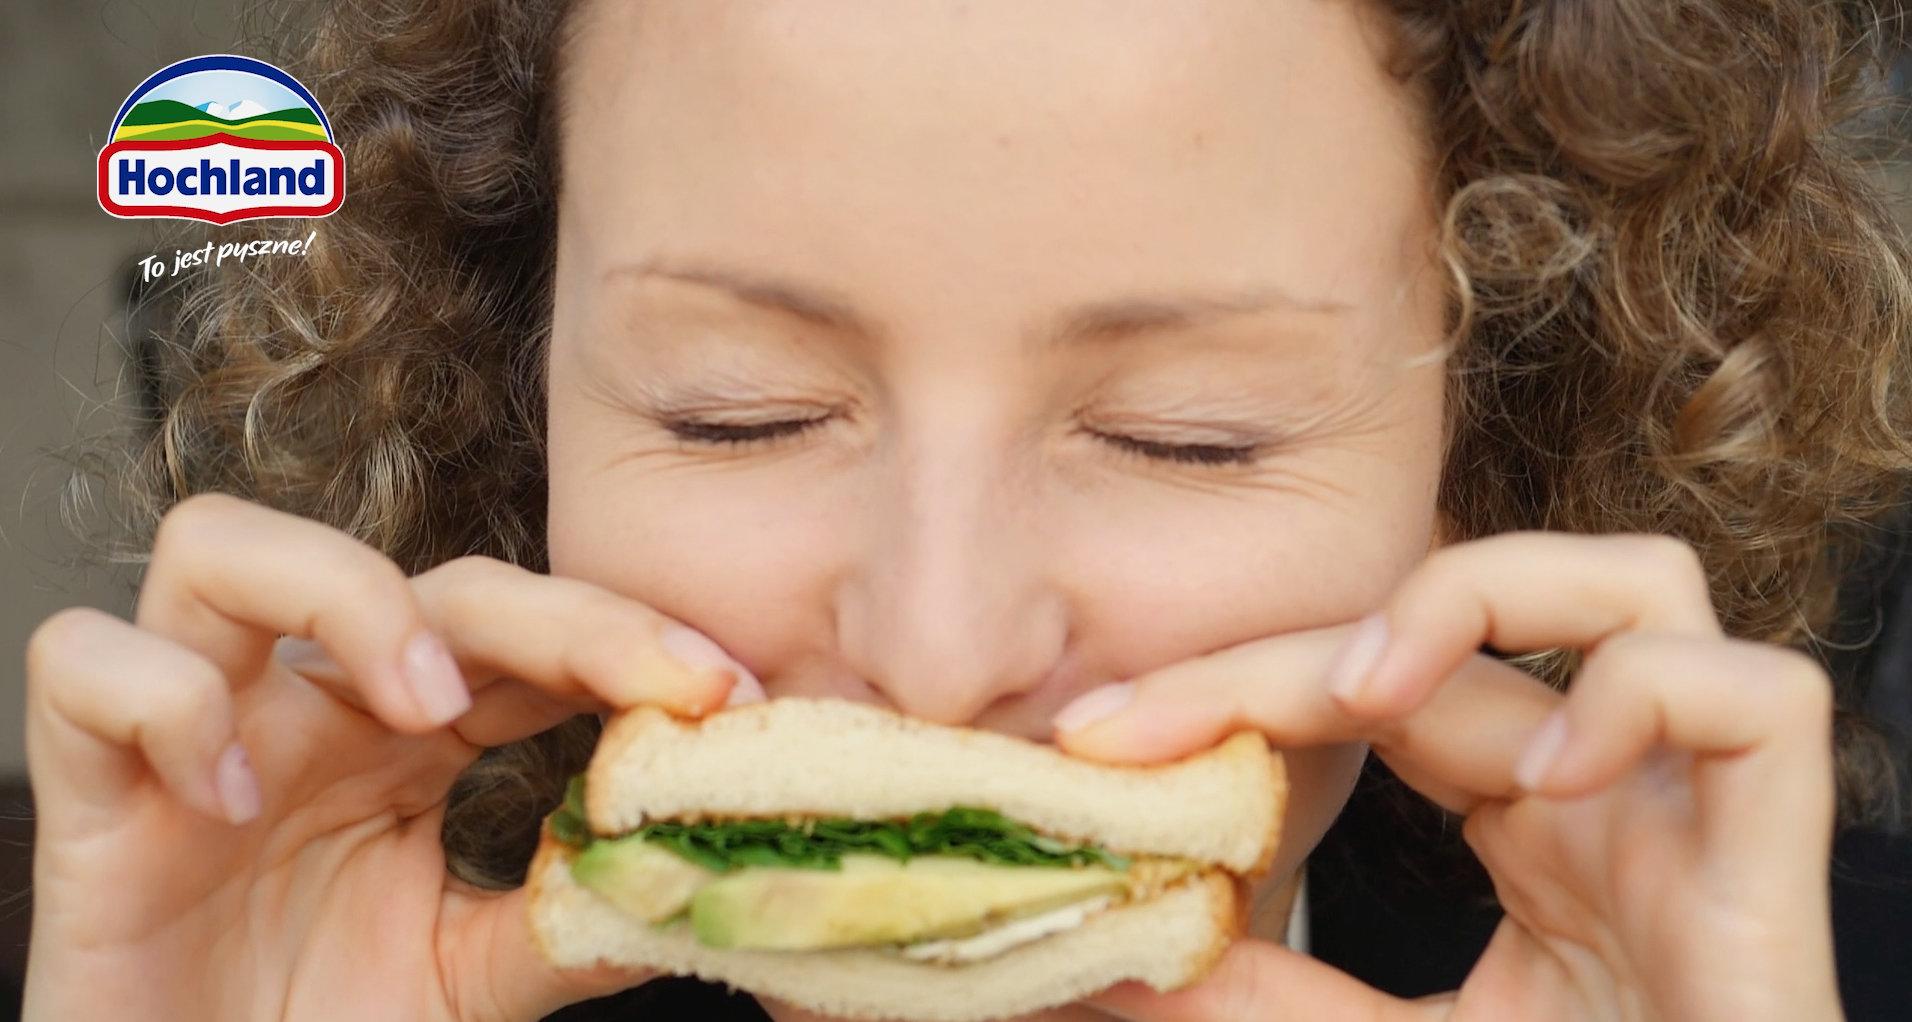 Z całego sera kochamy kanapki i burgery!